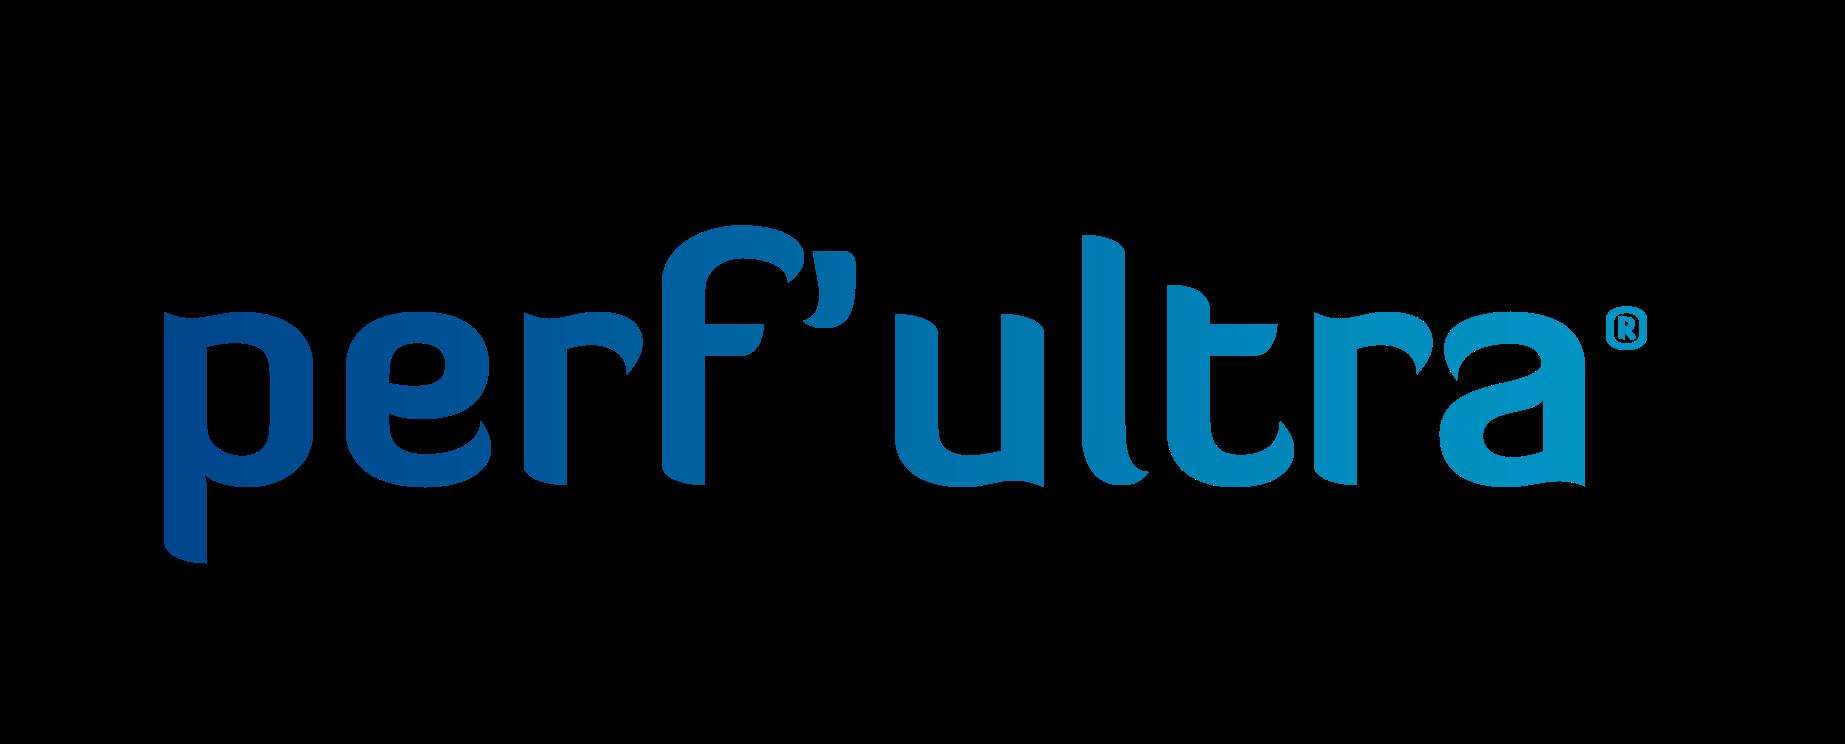 PERF'ULTRA